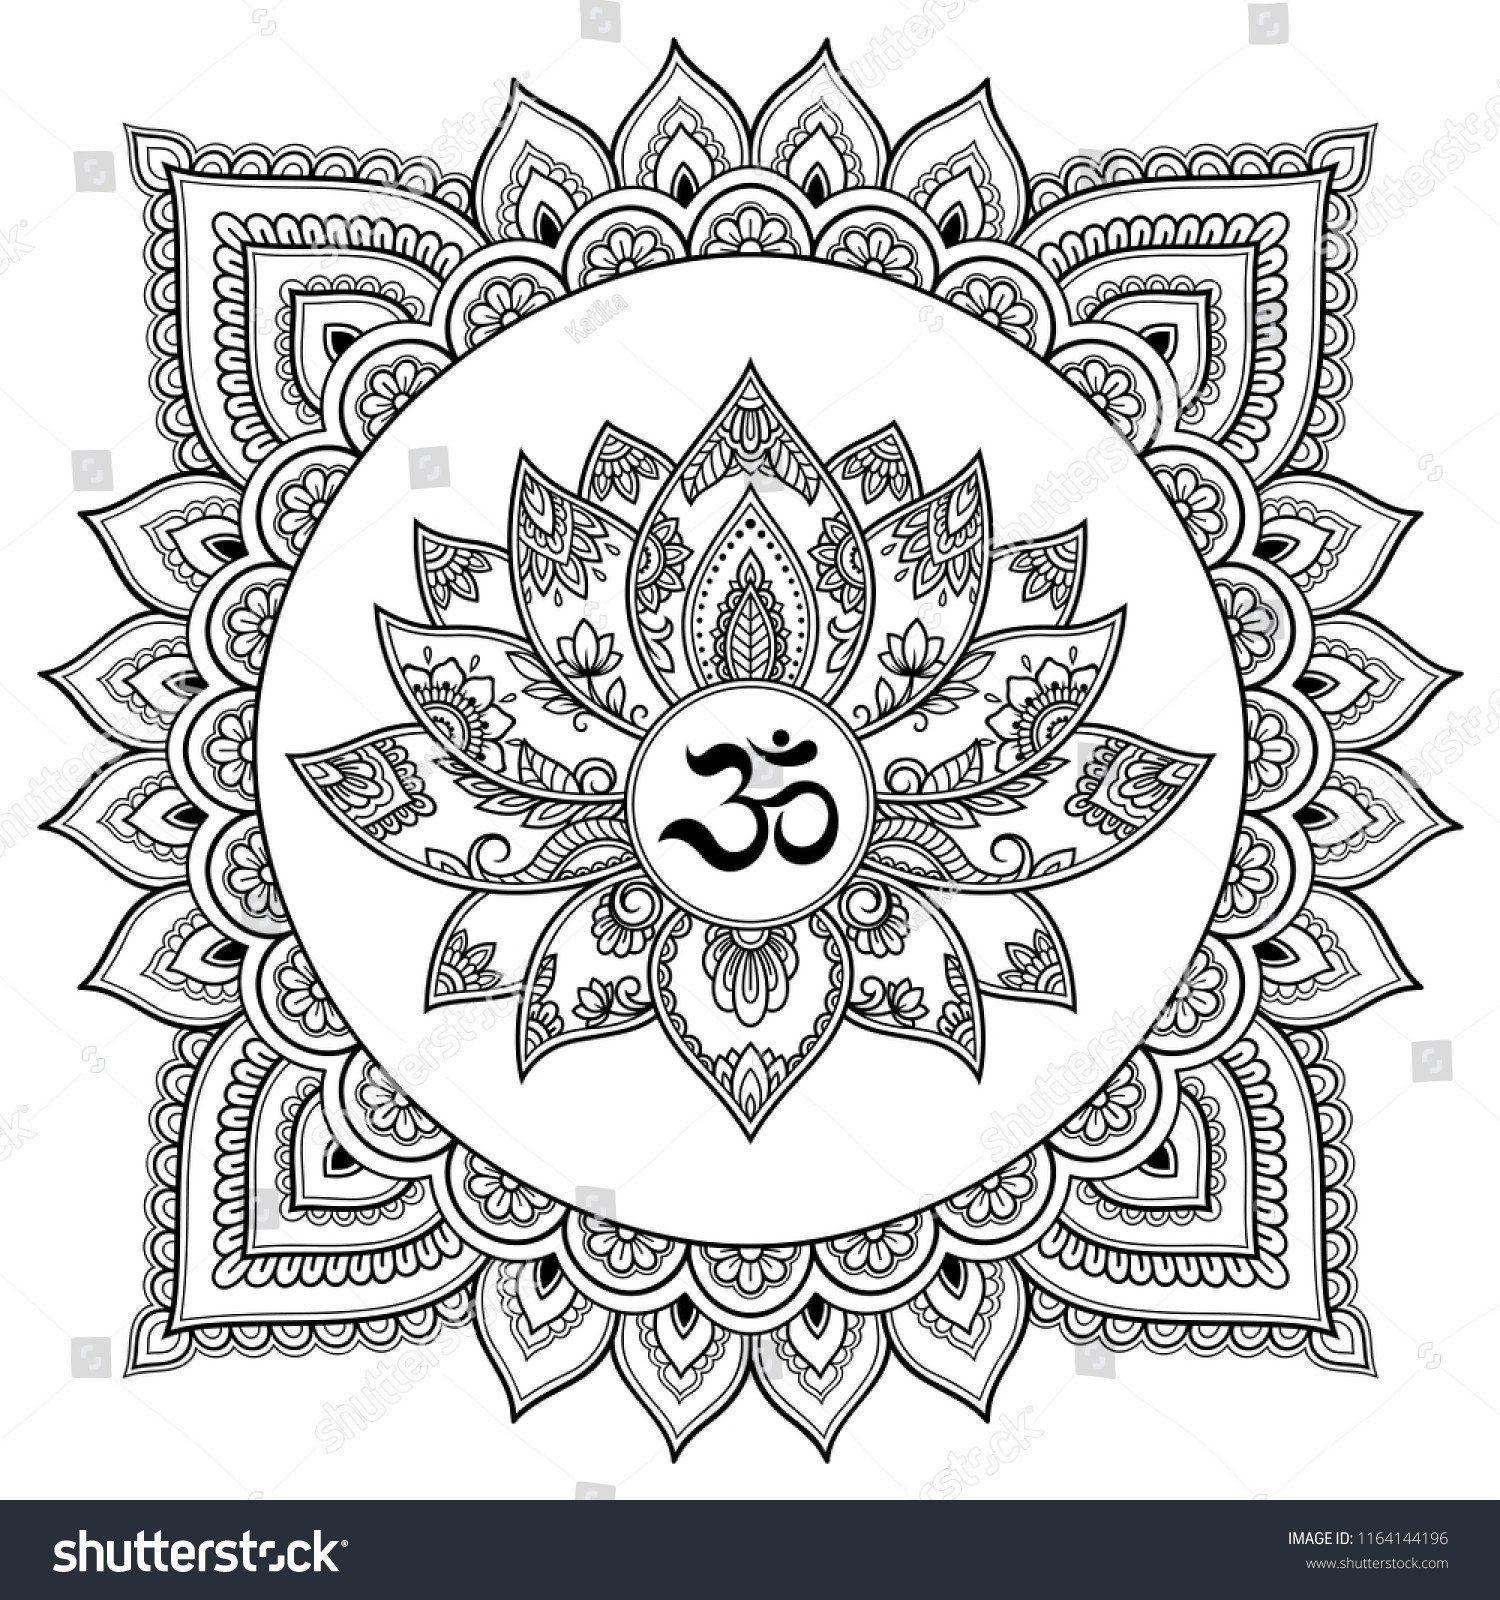 Hindu Mandala Coloring Pages D N D Dºd D D N D Dµdºn D N D D N D N D N D Dºd Circular Pattern Form Mandala Mandala Lotus Flower Mandalas Dibujos De Loto